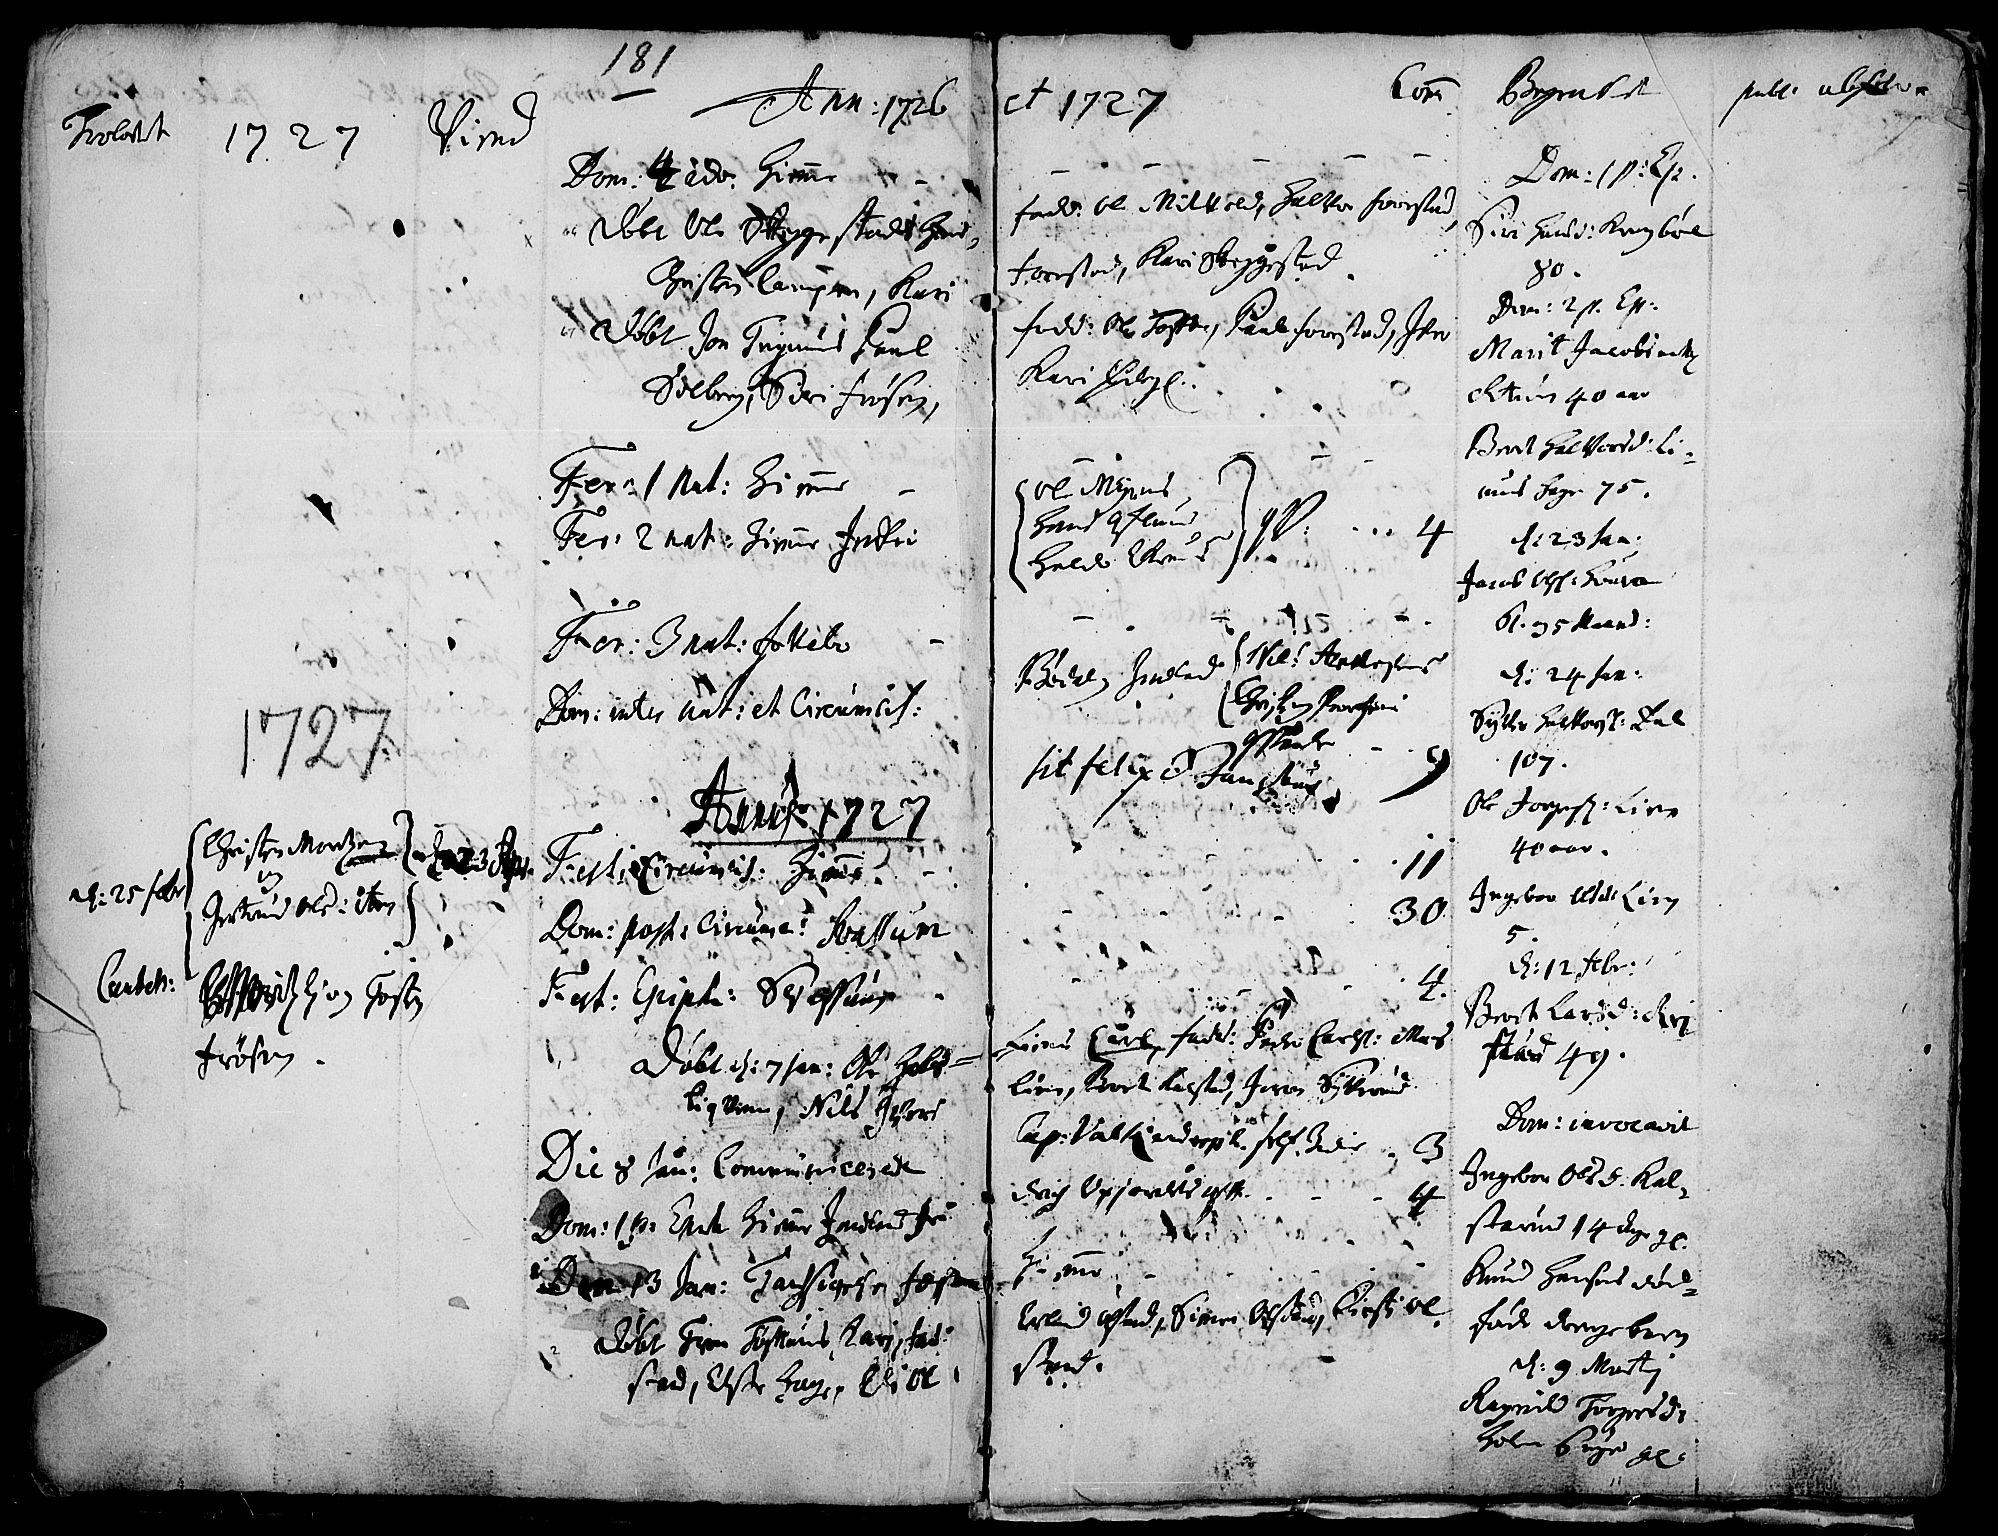 SAH, Gausdal prestekontor, Ministerialbok nr. 1, 1693-1728, s. 181